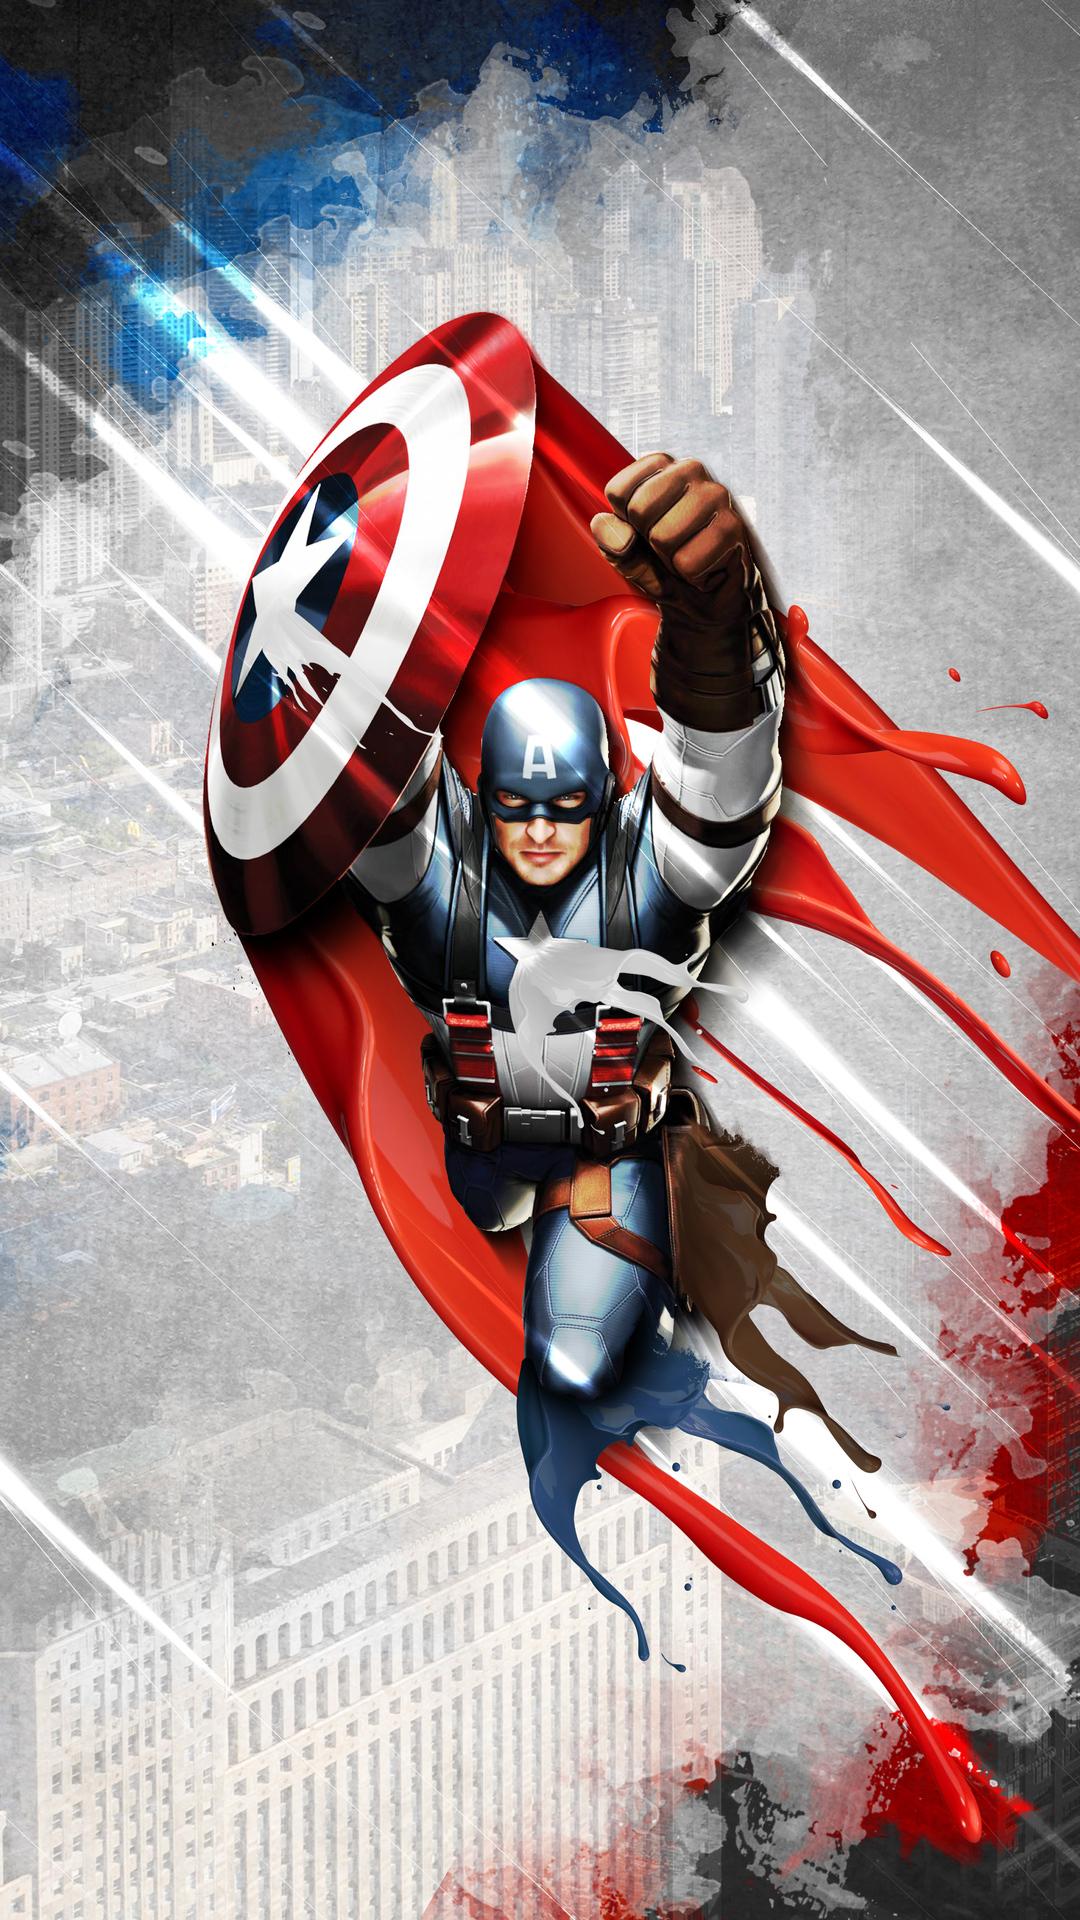 1080x1920 4k New Captain America Iphone 7,6s,6 Plus, Pixel ...